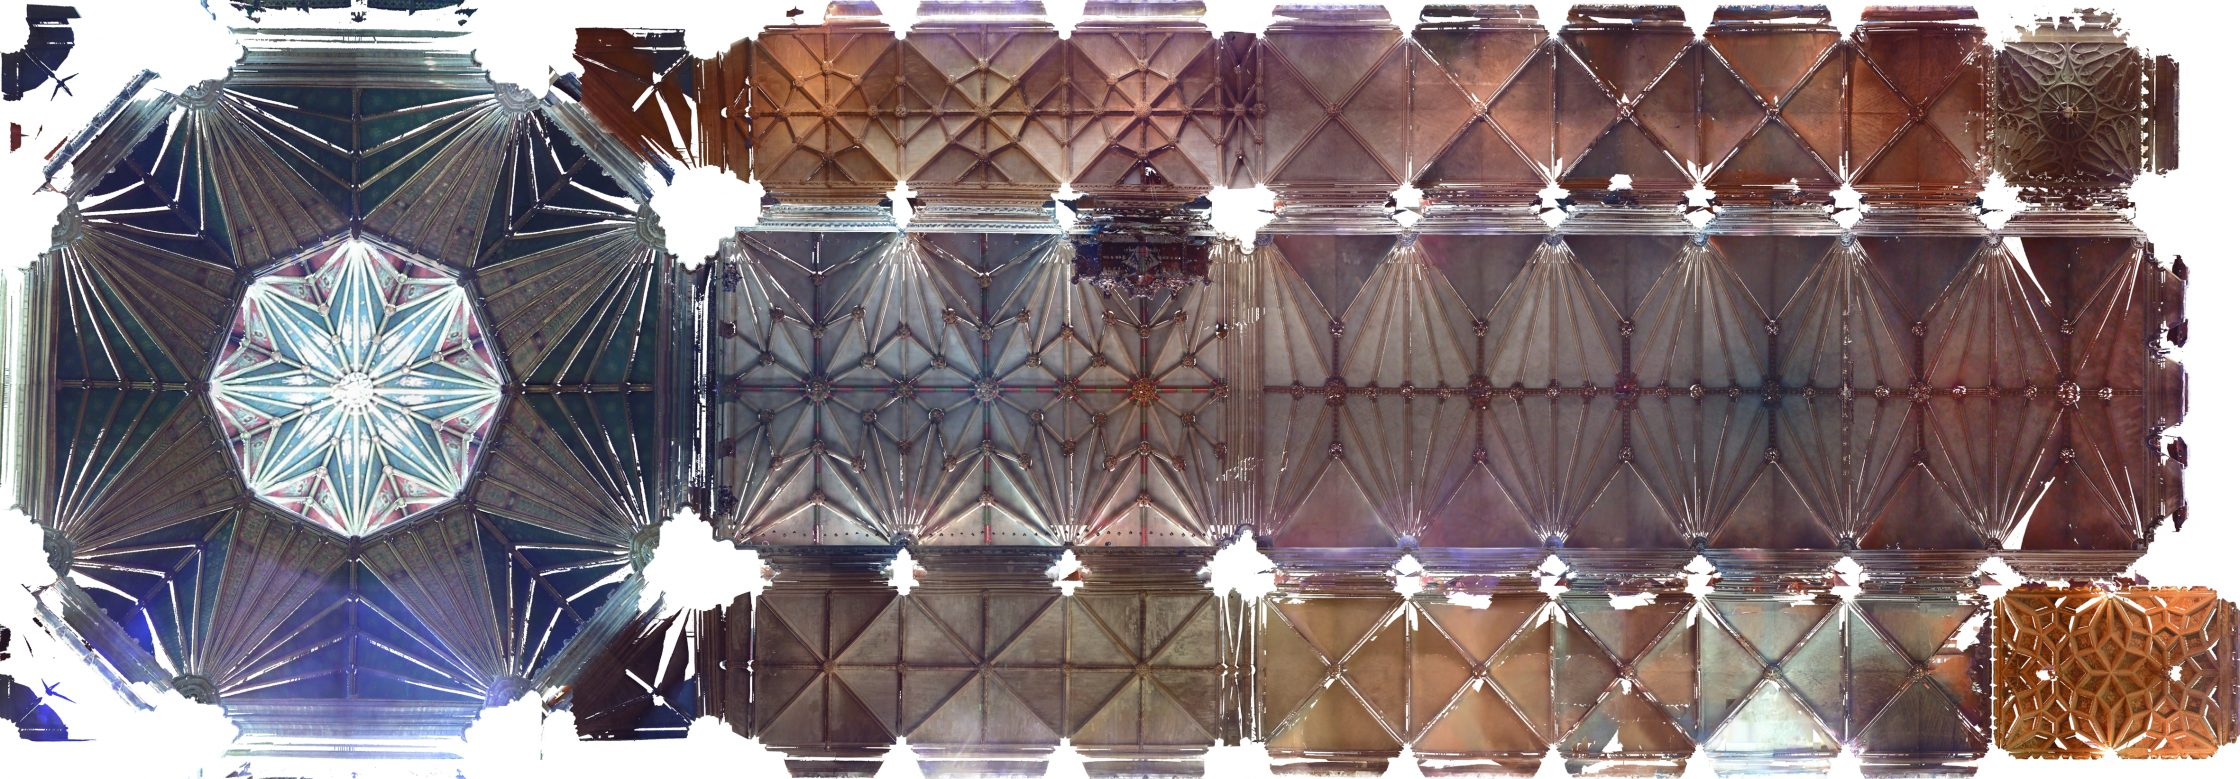 TtP_Ely_ortho_roof_plan-300v2